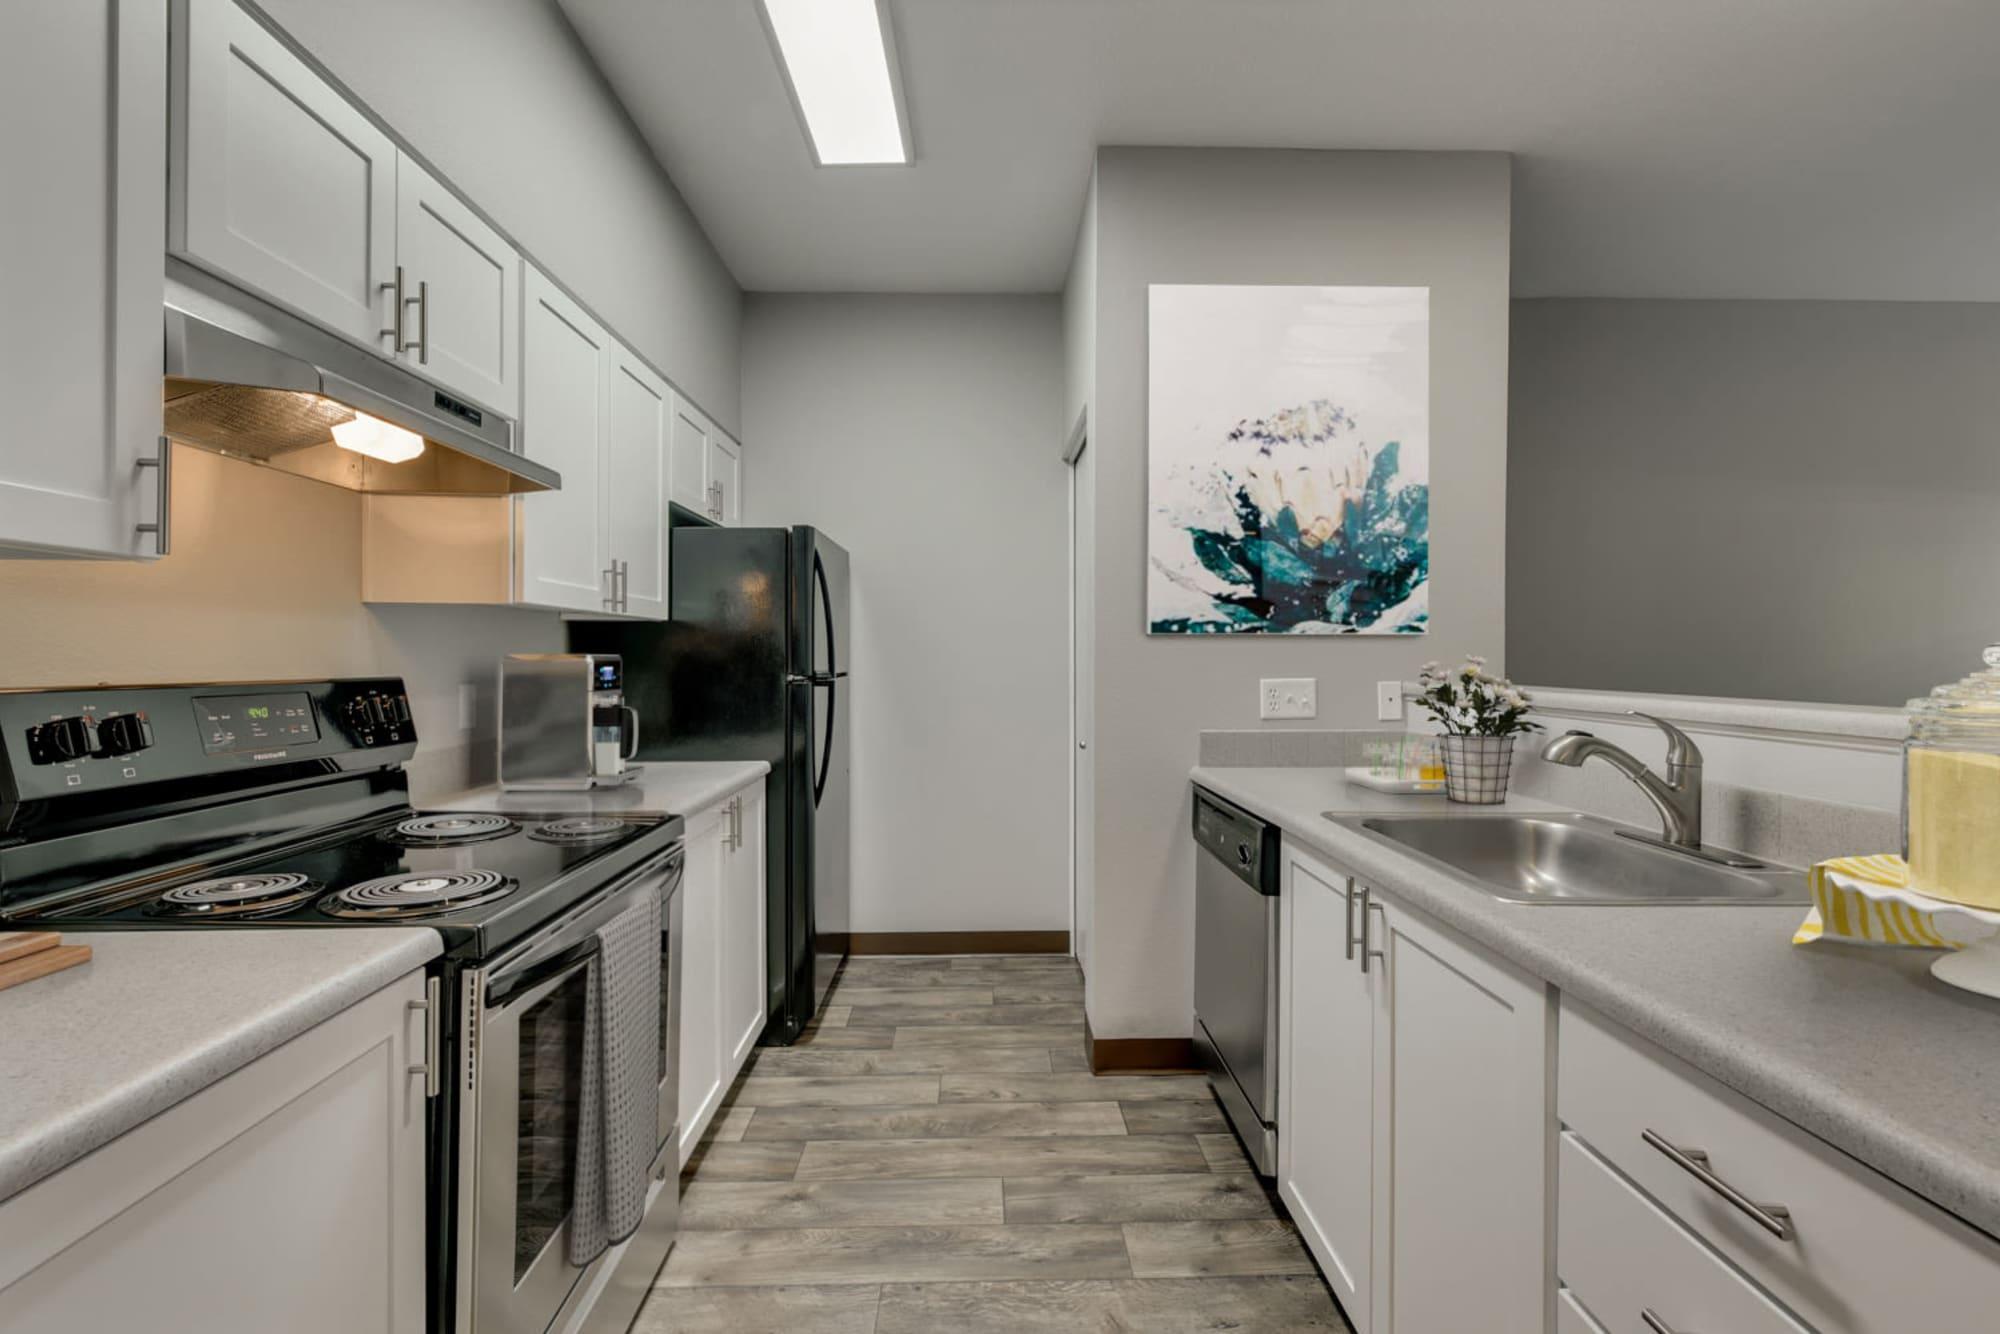 White Kitchen Renovation at The Landings at Morrison Apartments in Gresham, Oregon